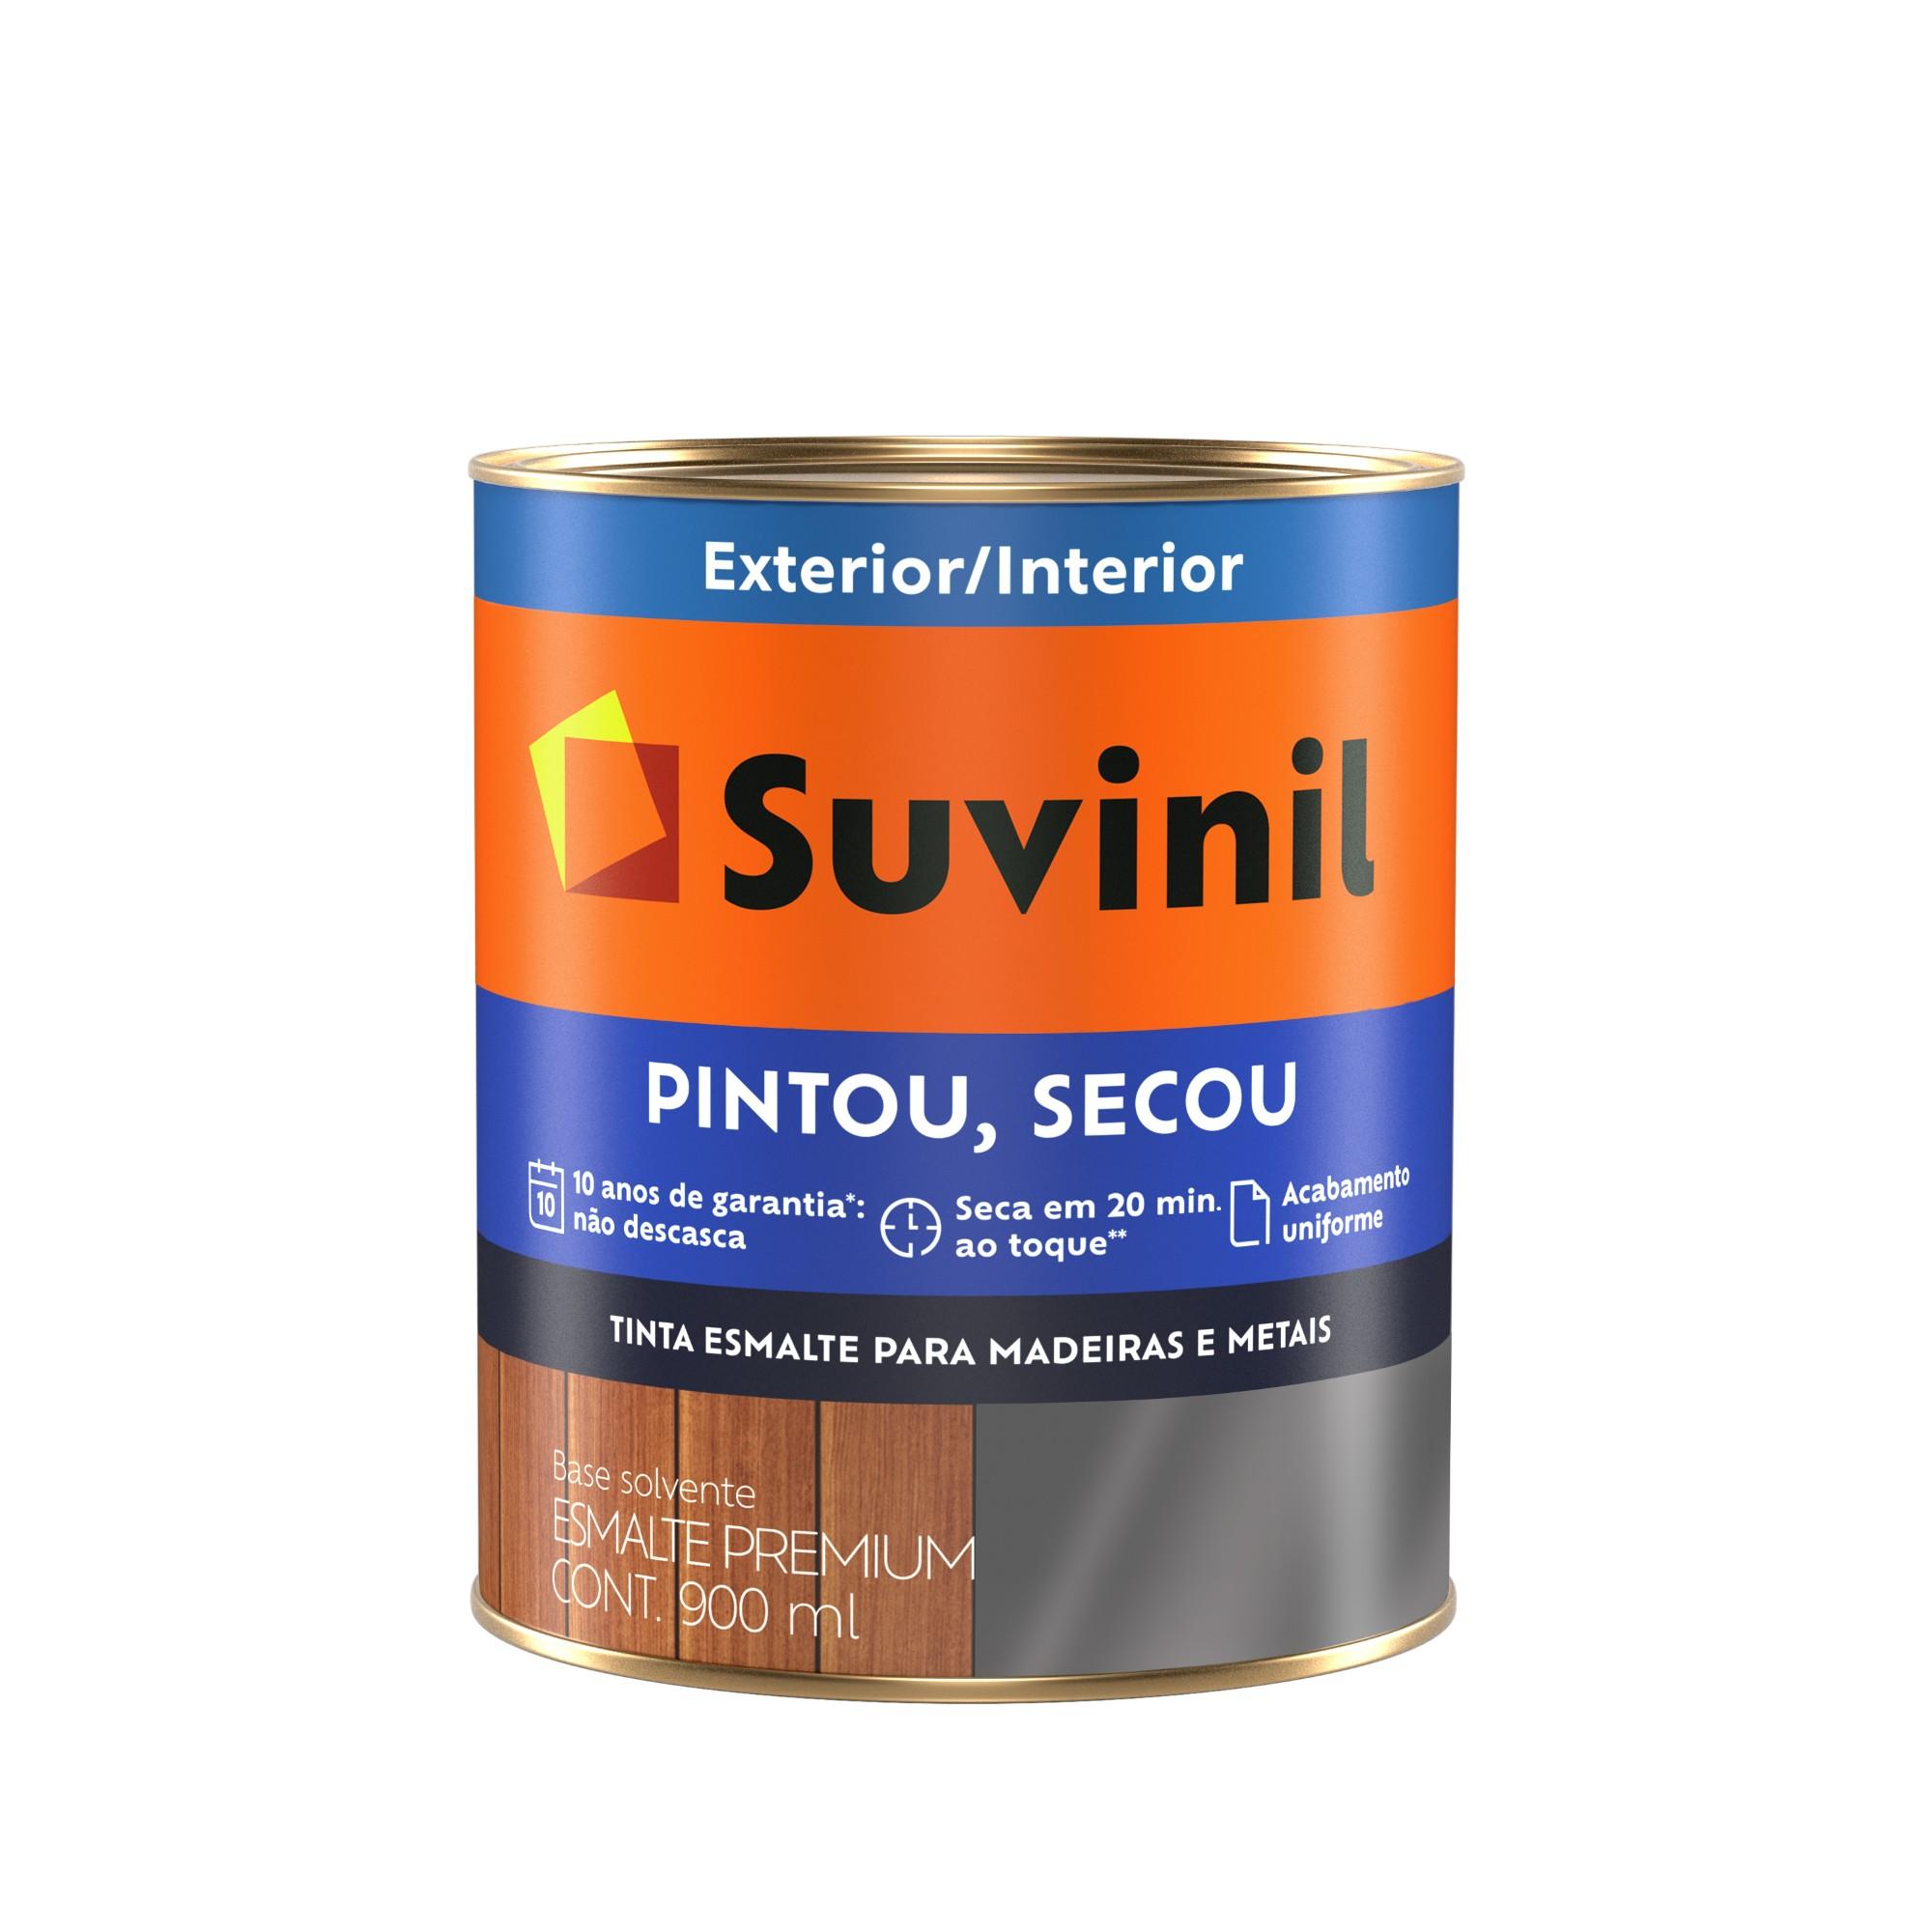 Tinta Esmalte Sintetico Brilhante Premium 09L - Branco - Pintou Secou Suvinil